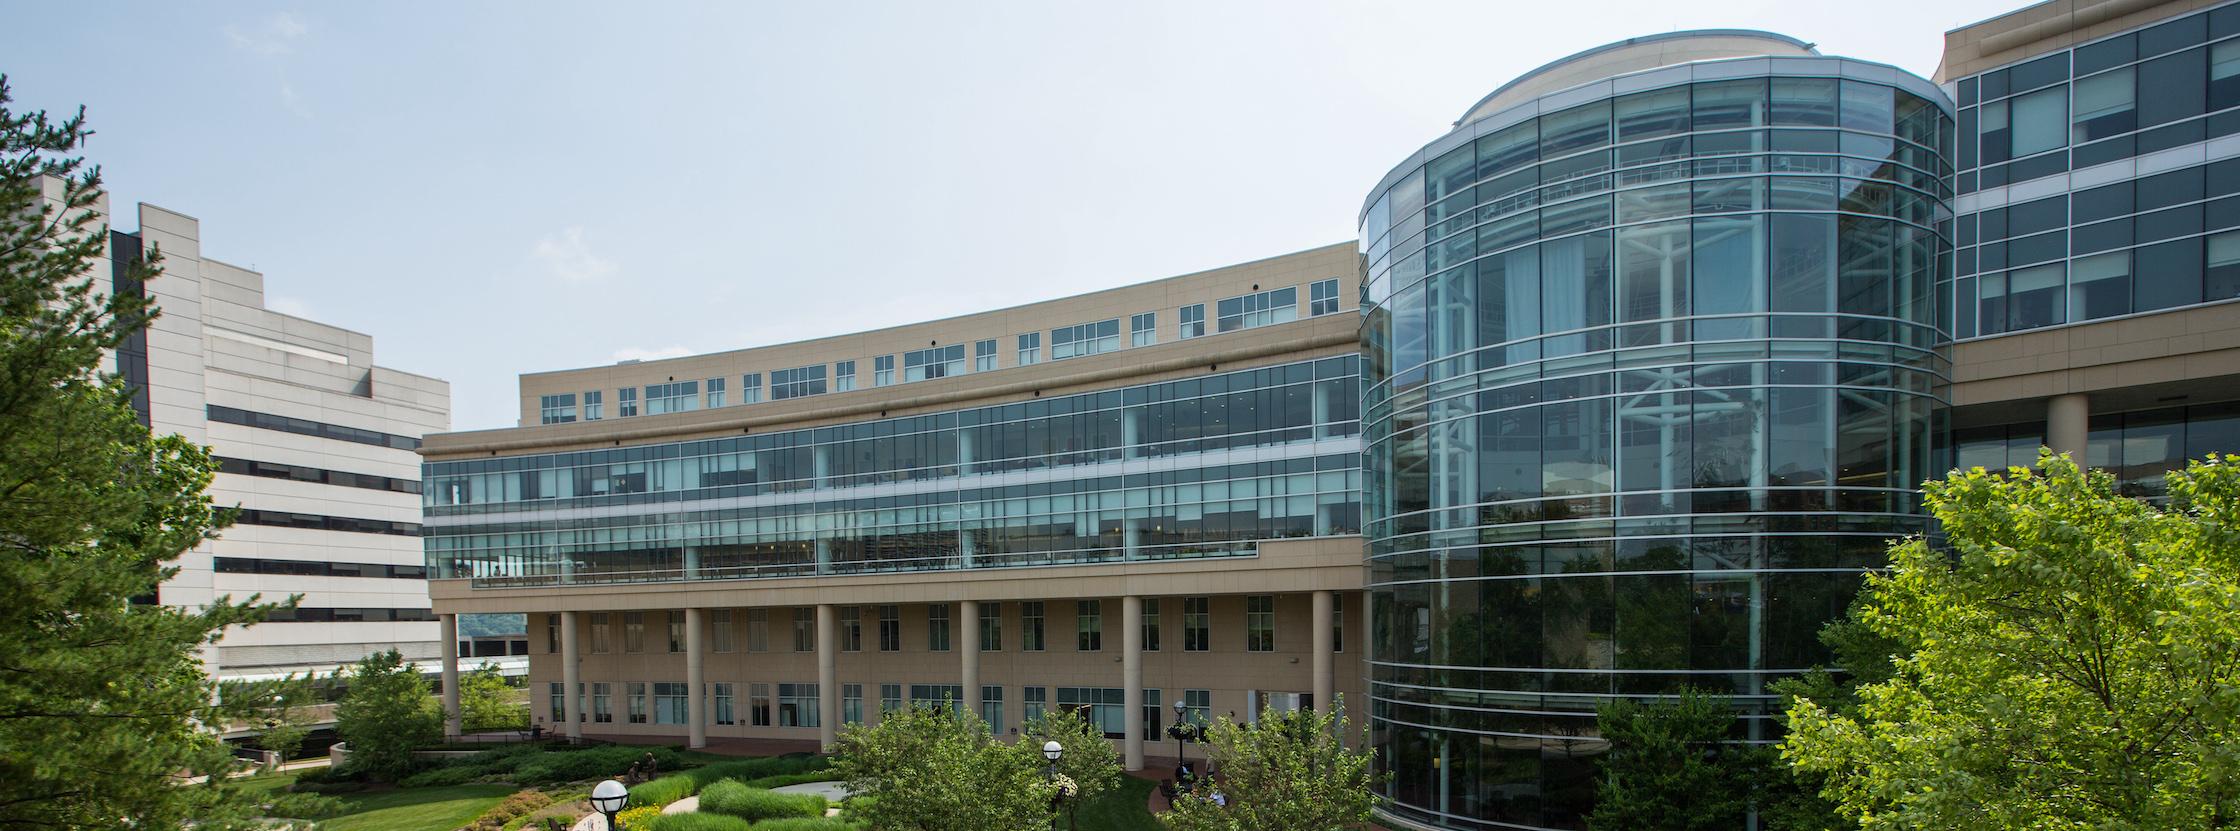 Michigan Medicine Frankel Cardiovascular Center